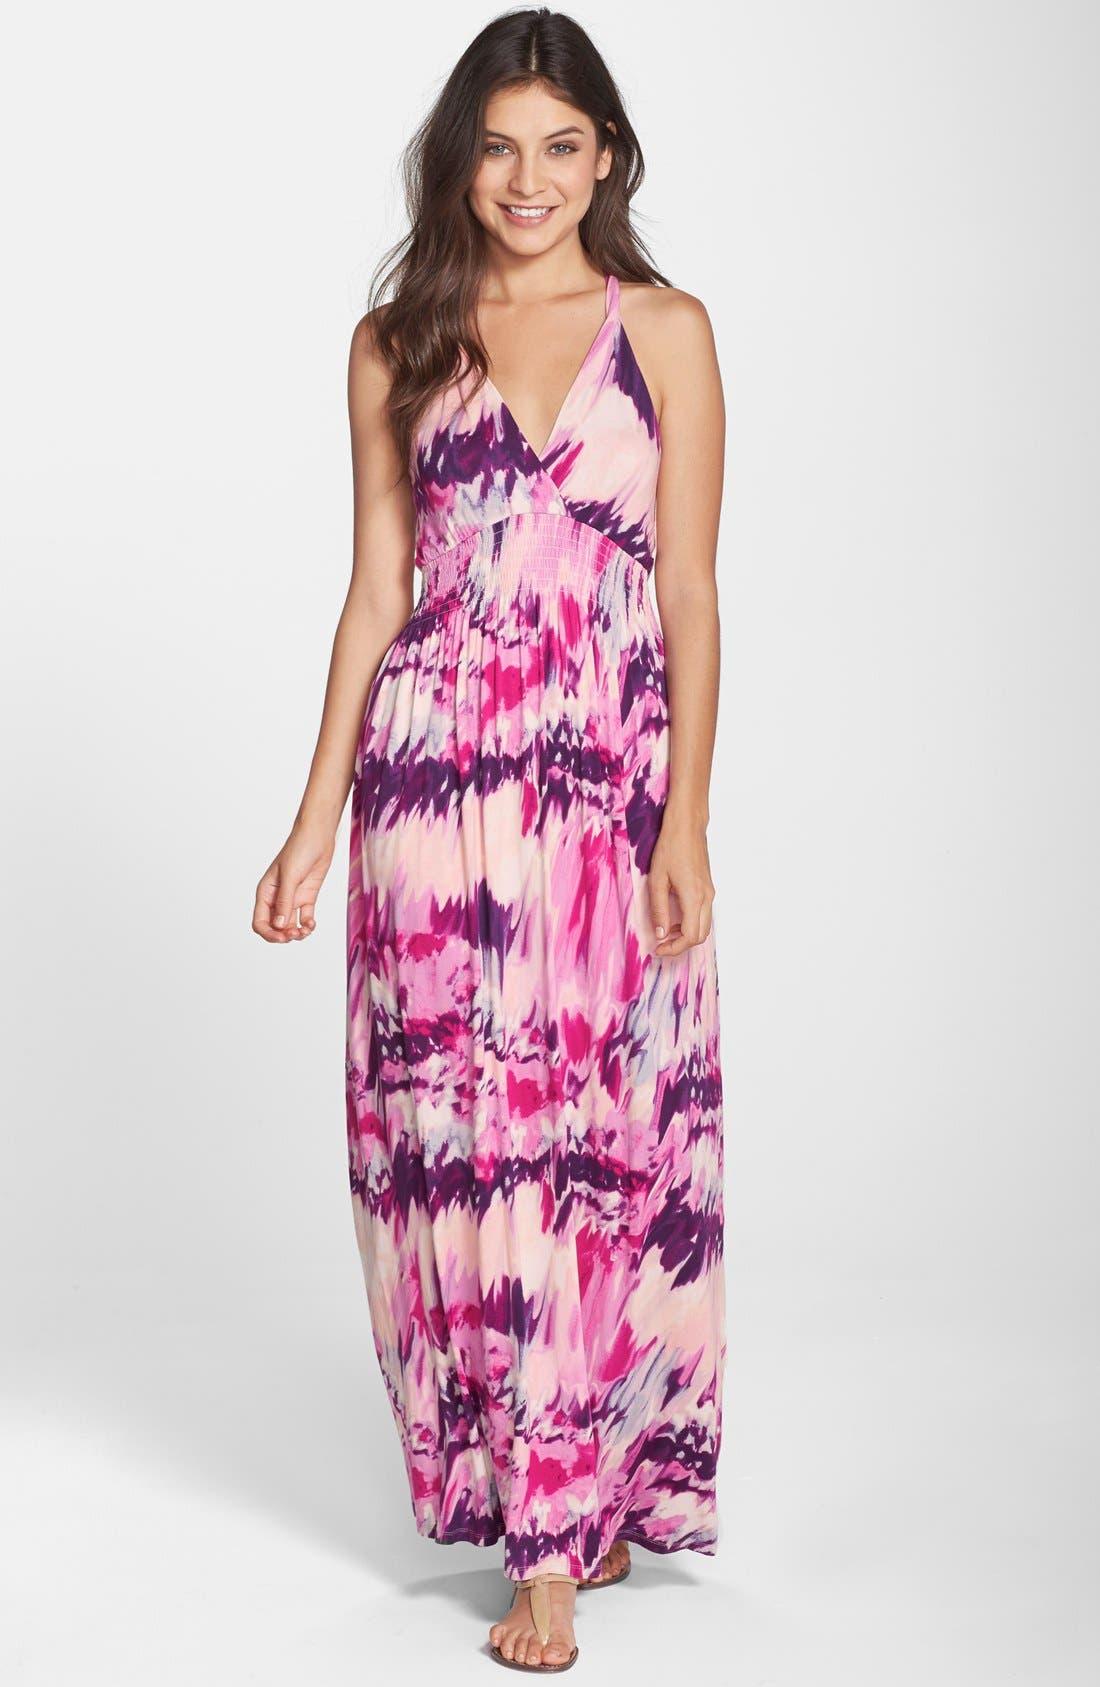 Main Image - Felicity & Coco 'Nina' Print Jersey Maxi Dress (Regular & Petite) (Nordstrom Exclusive)